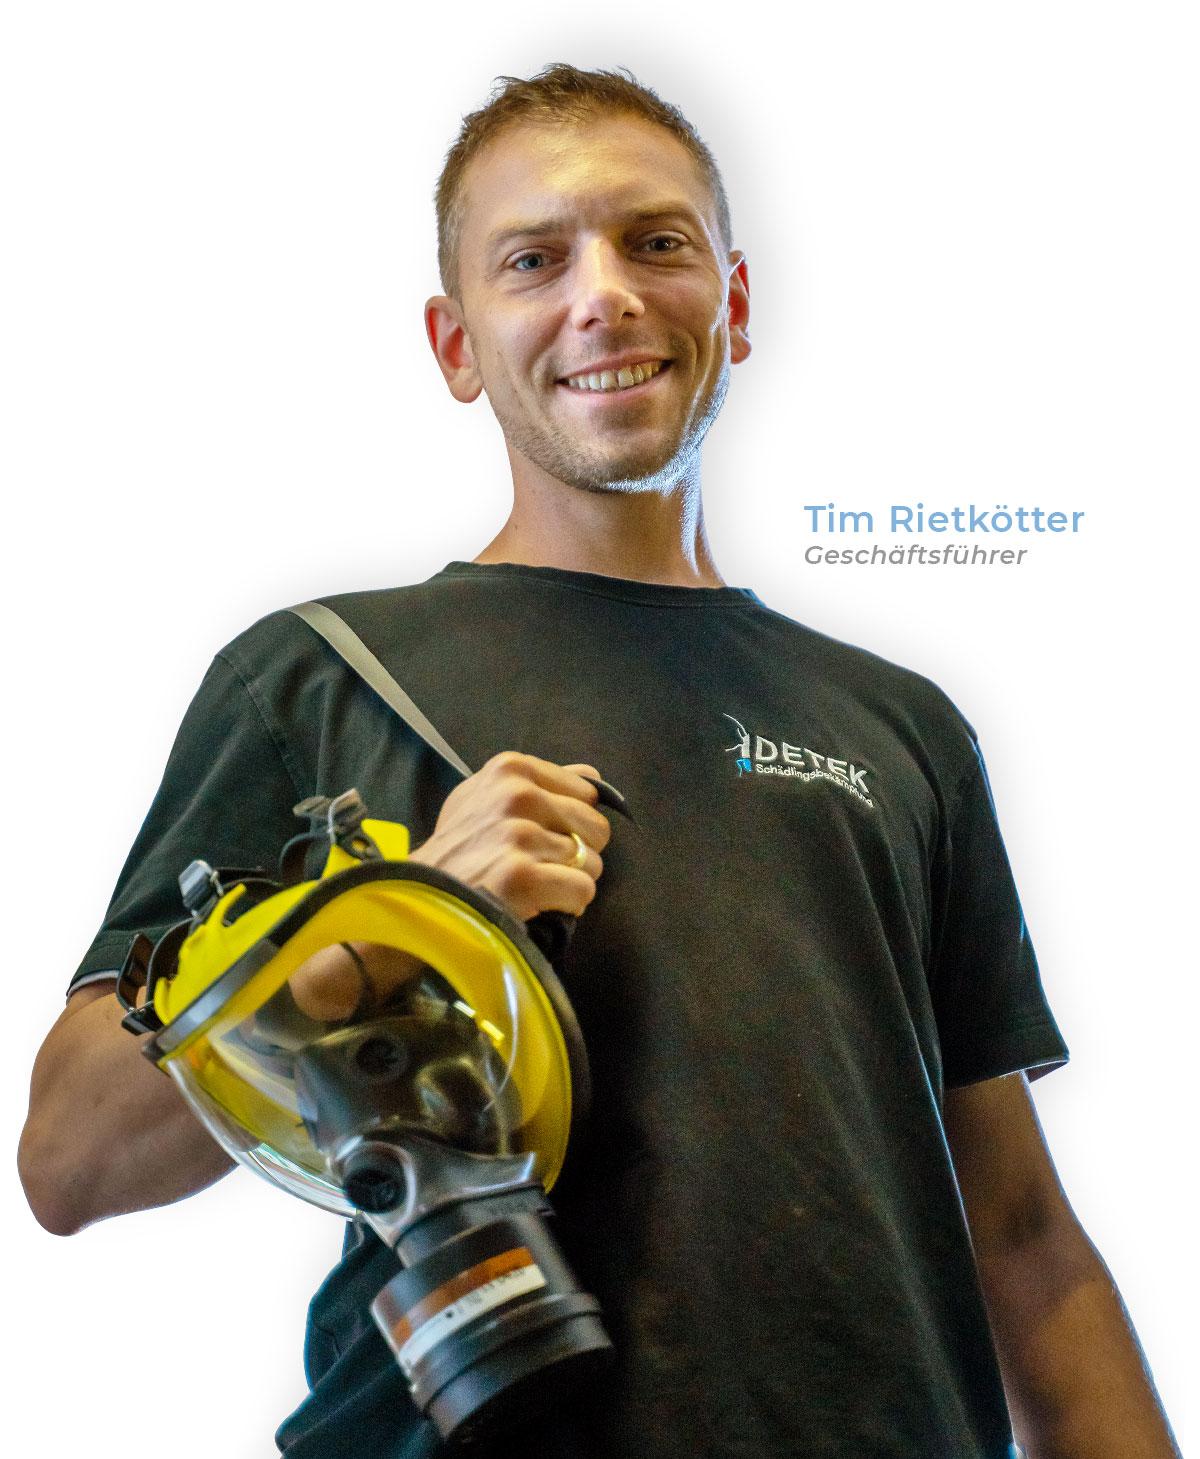 Tim Rietkötter, Geschäftsführer DETEk Schädlingsbekämpfung GmbH